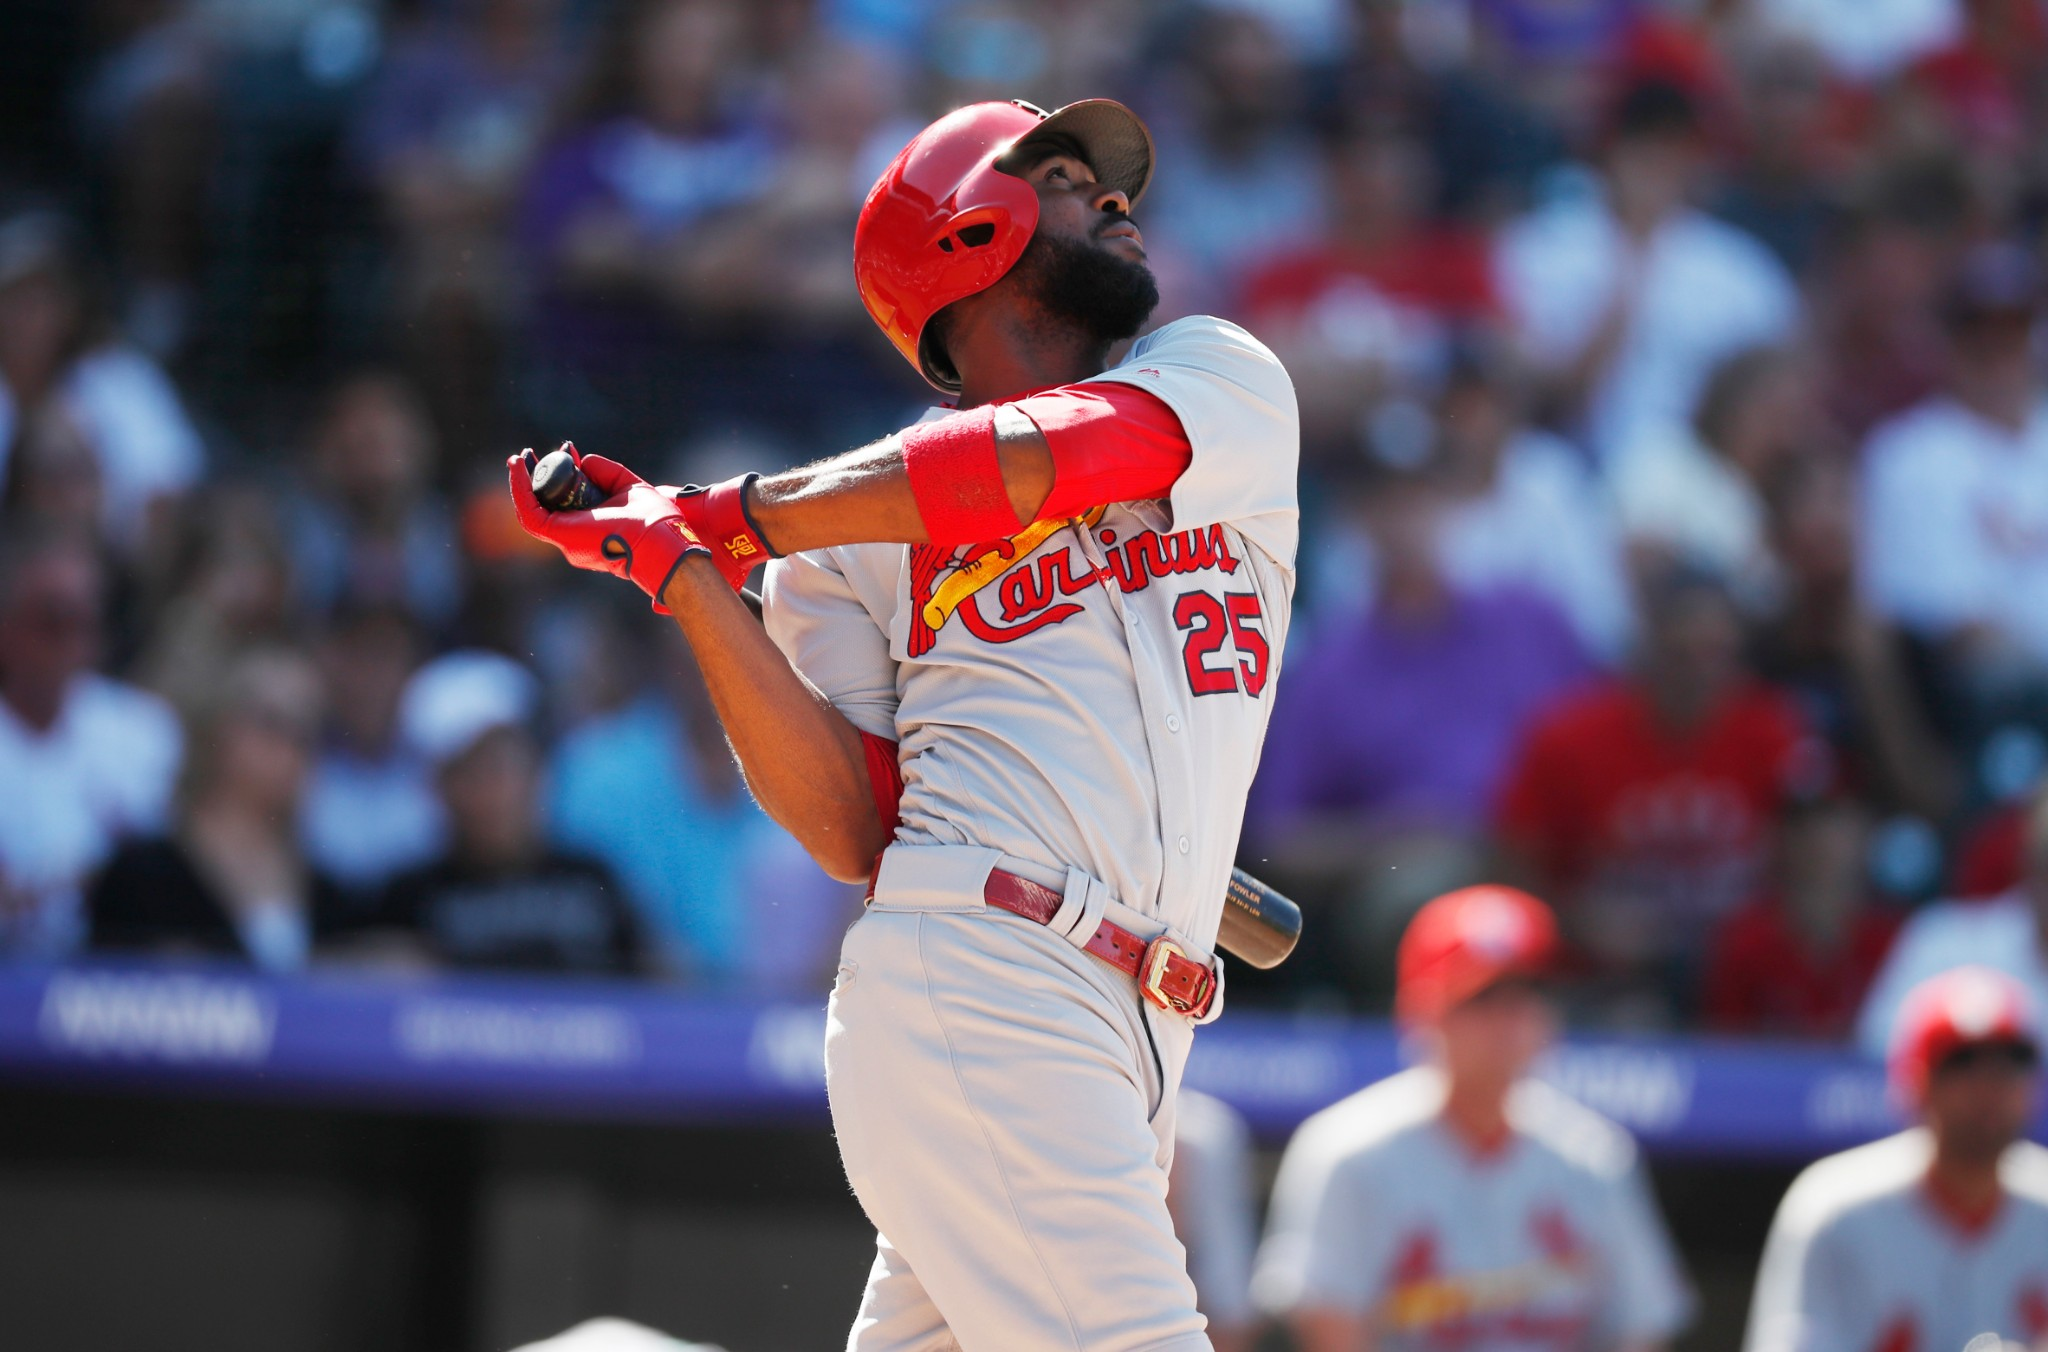 Sleepy Cardinals bats wake up in Colorado in 10-3 win